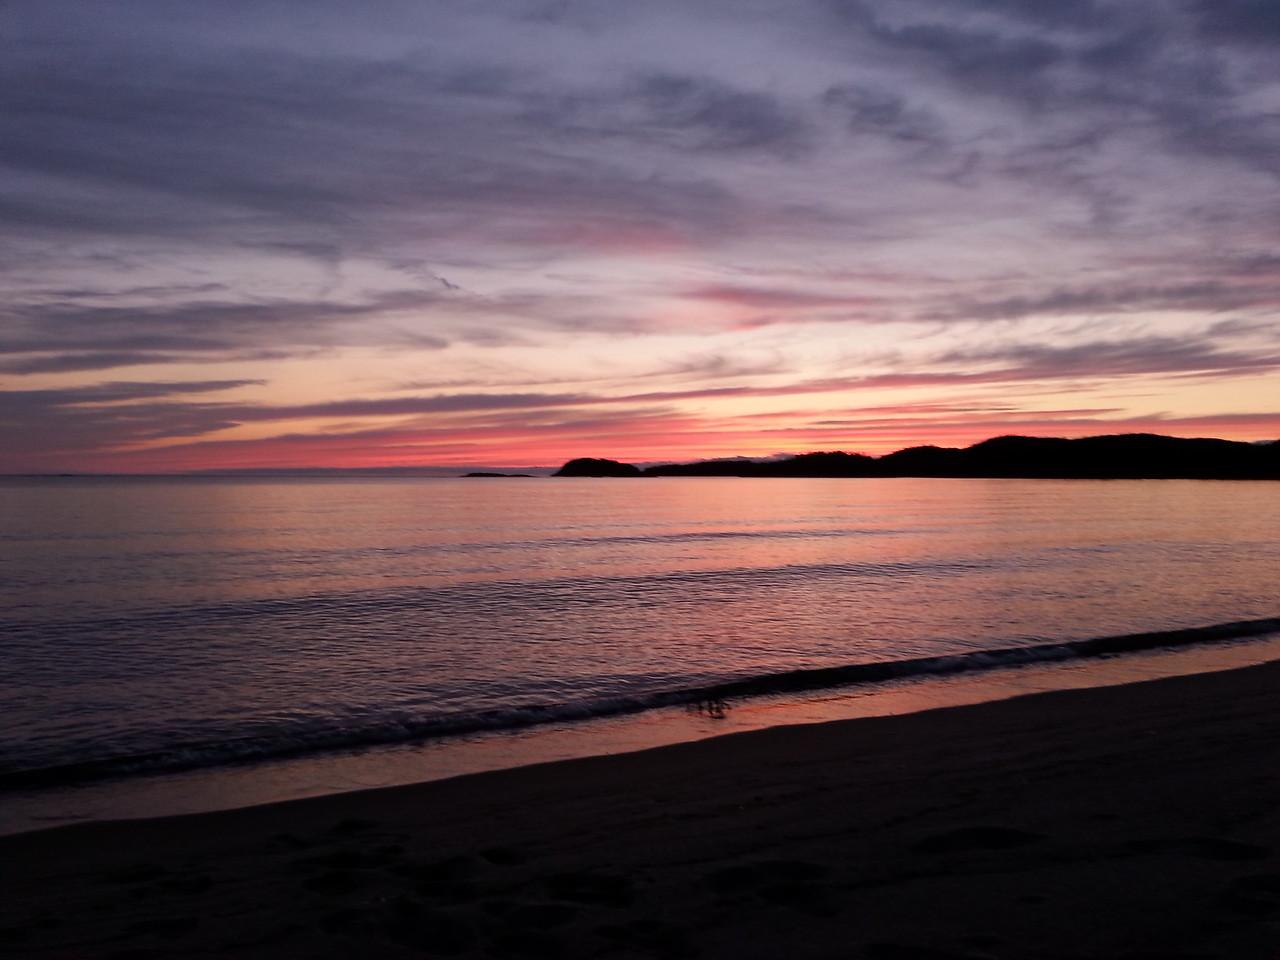 Sunset from Oiseau Bay